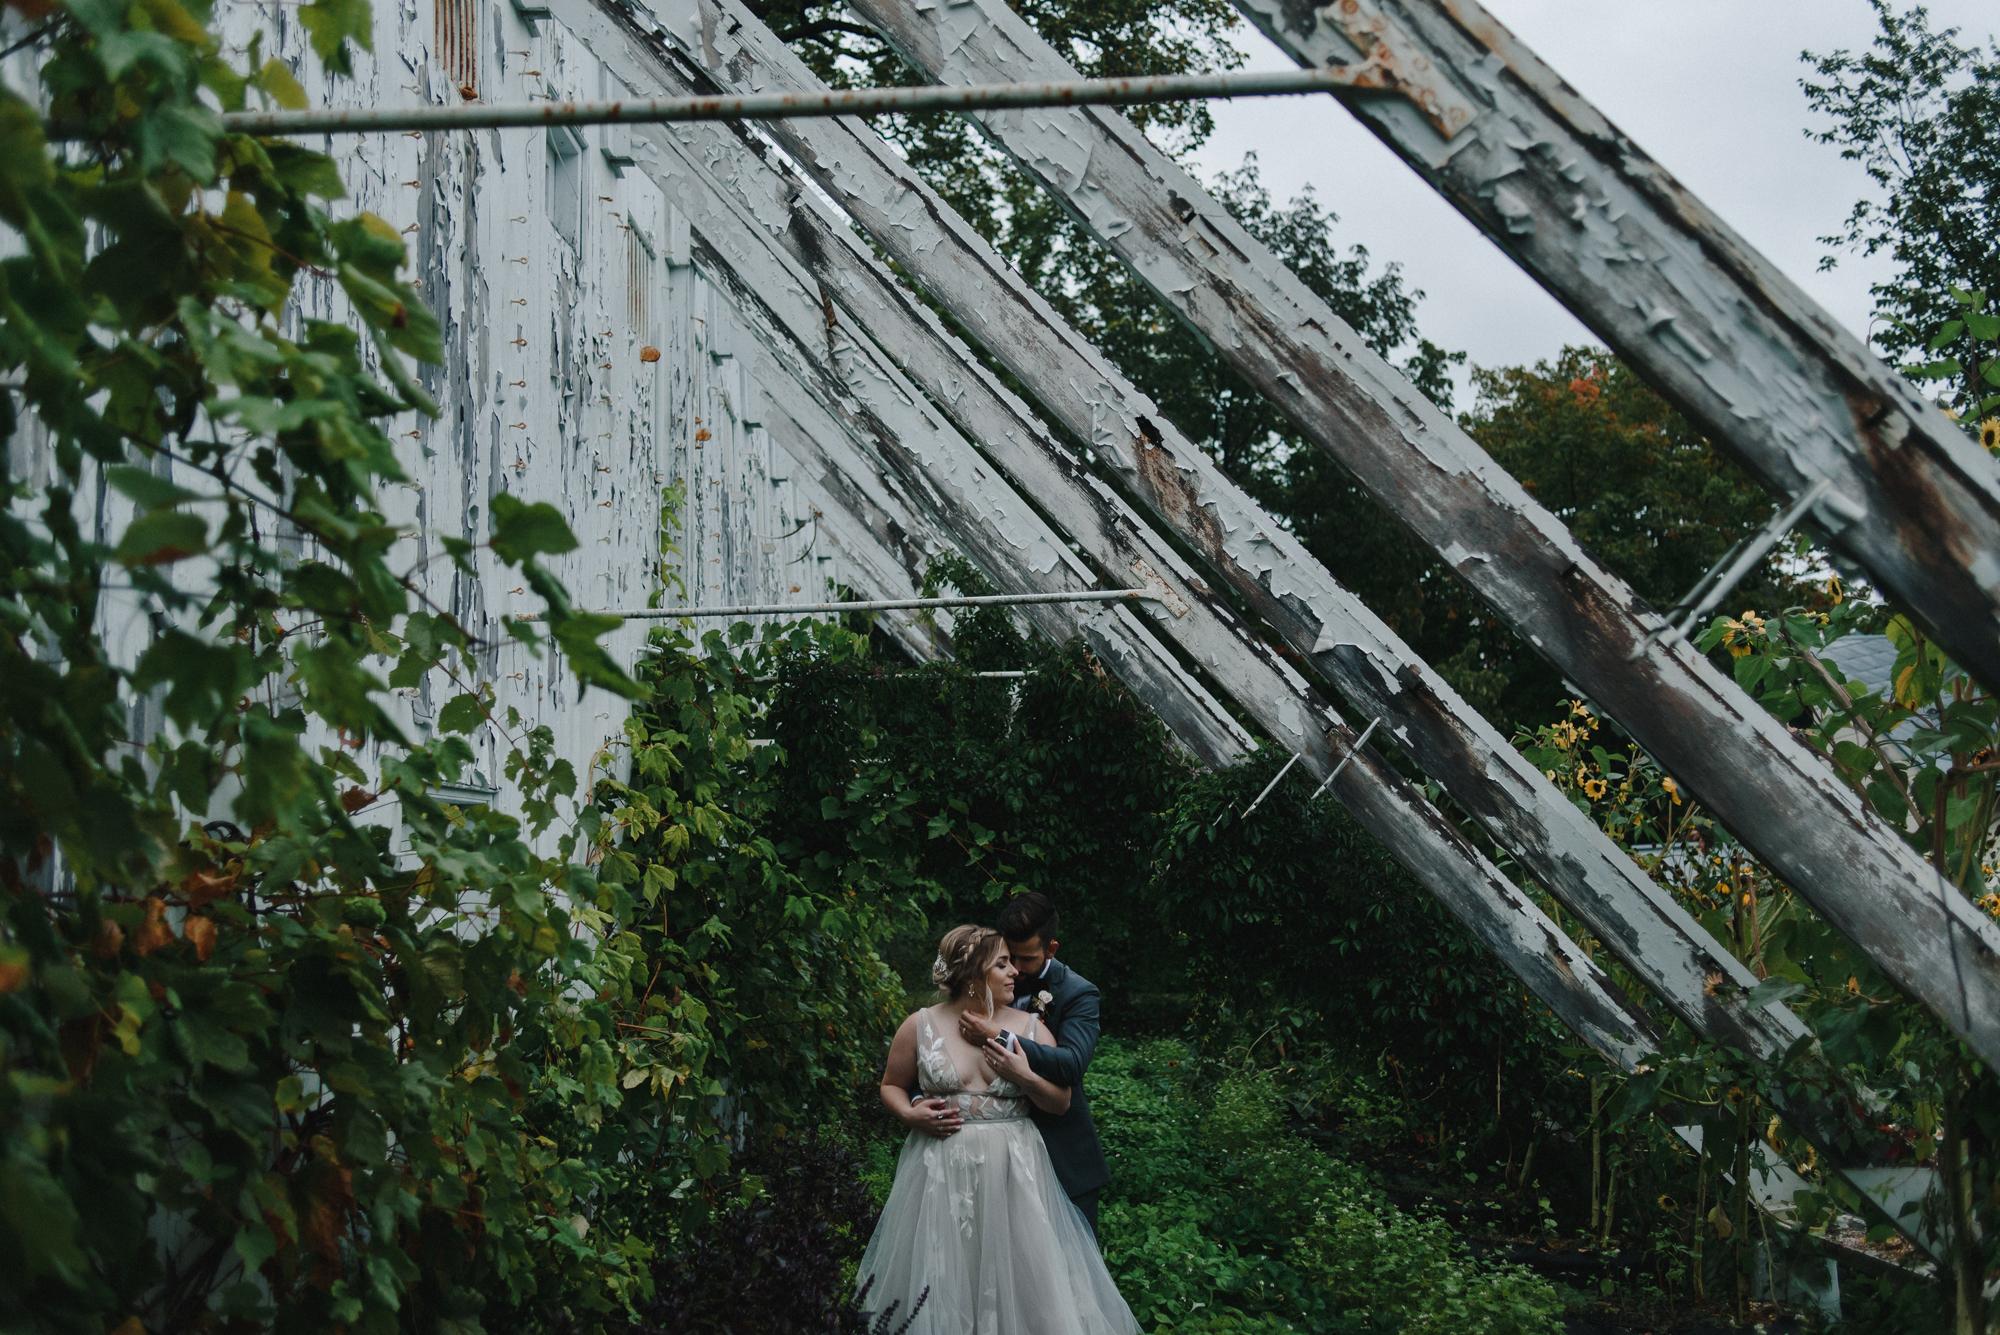 auguste_mariage_wedding_montreal_23.JPG